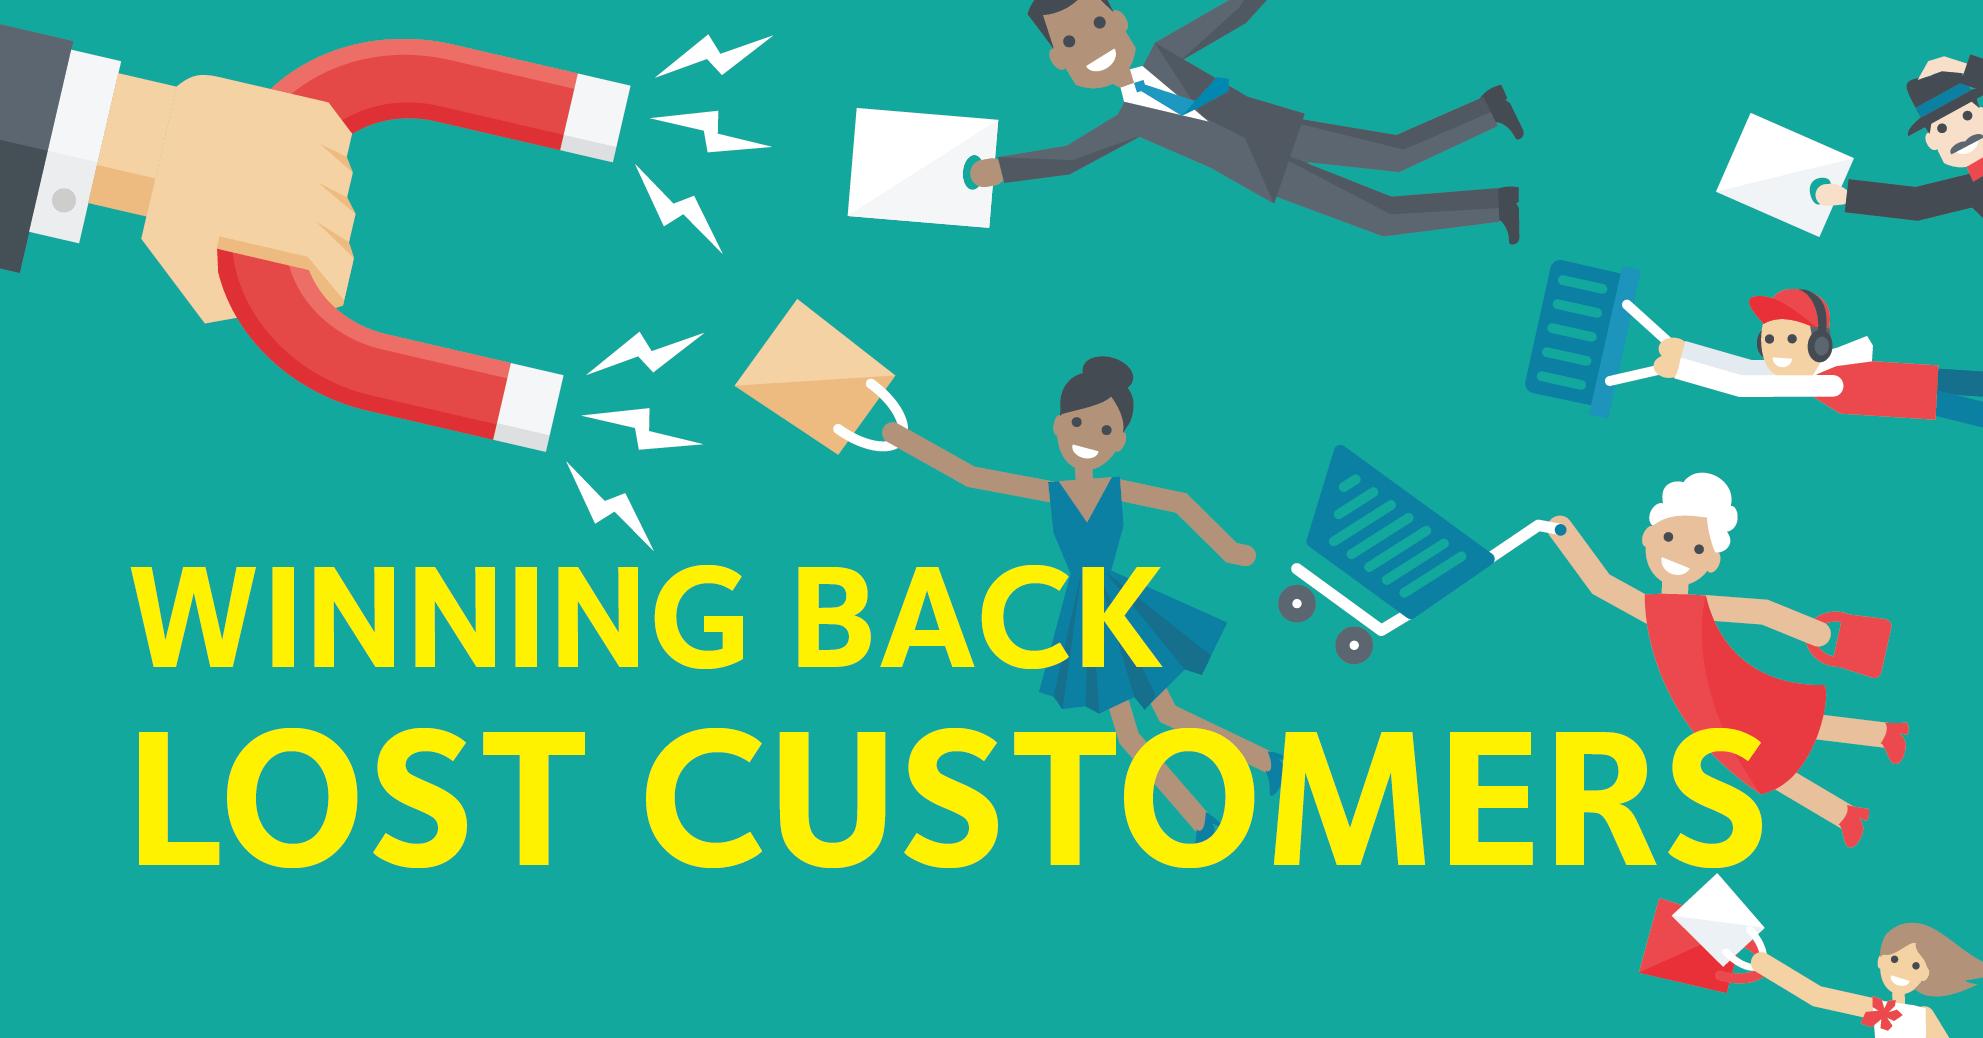 Why winning back lost customers makes sense